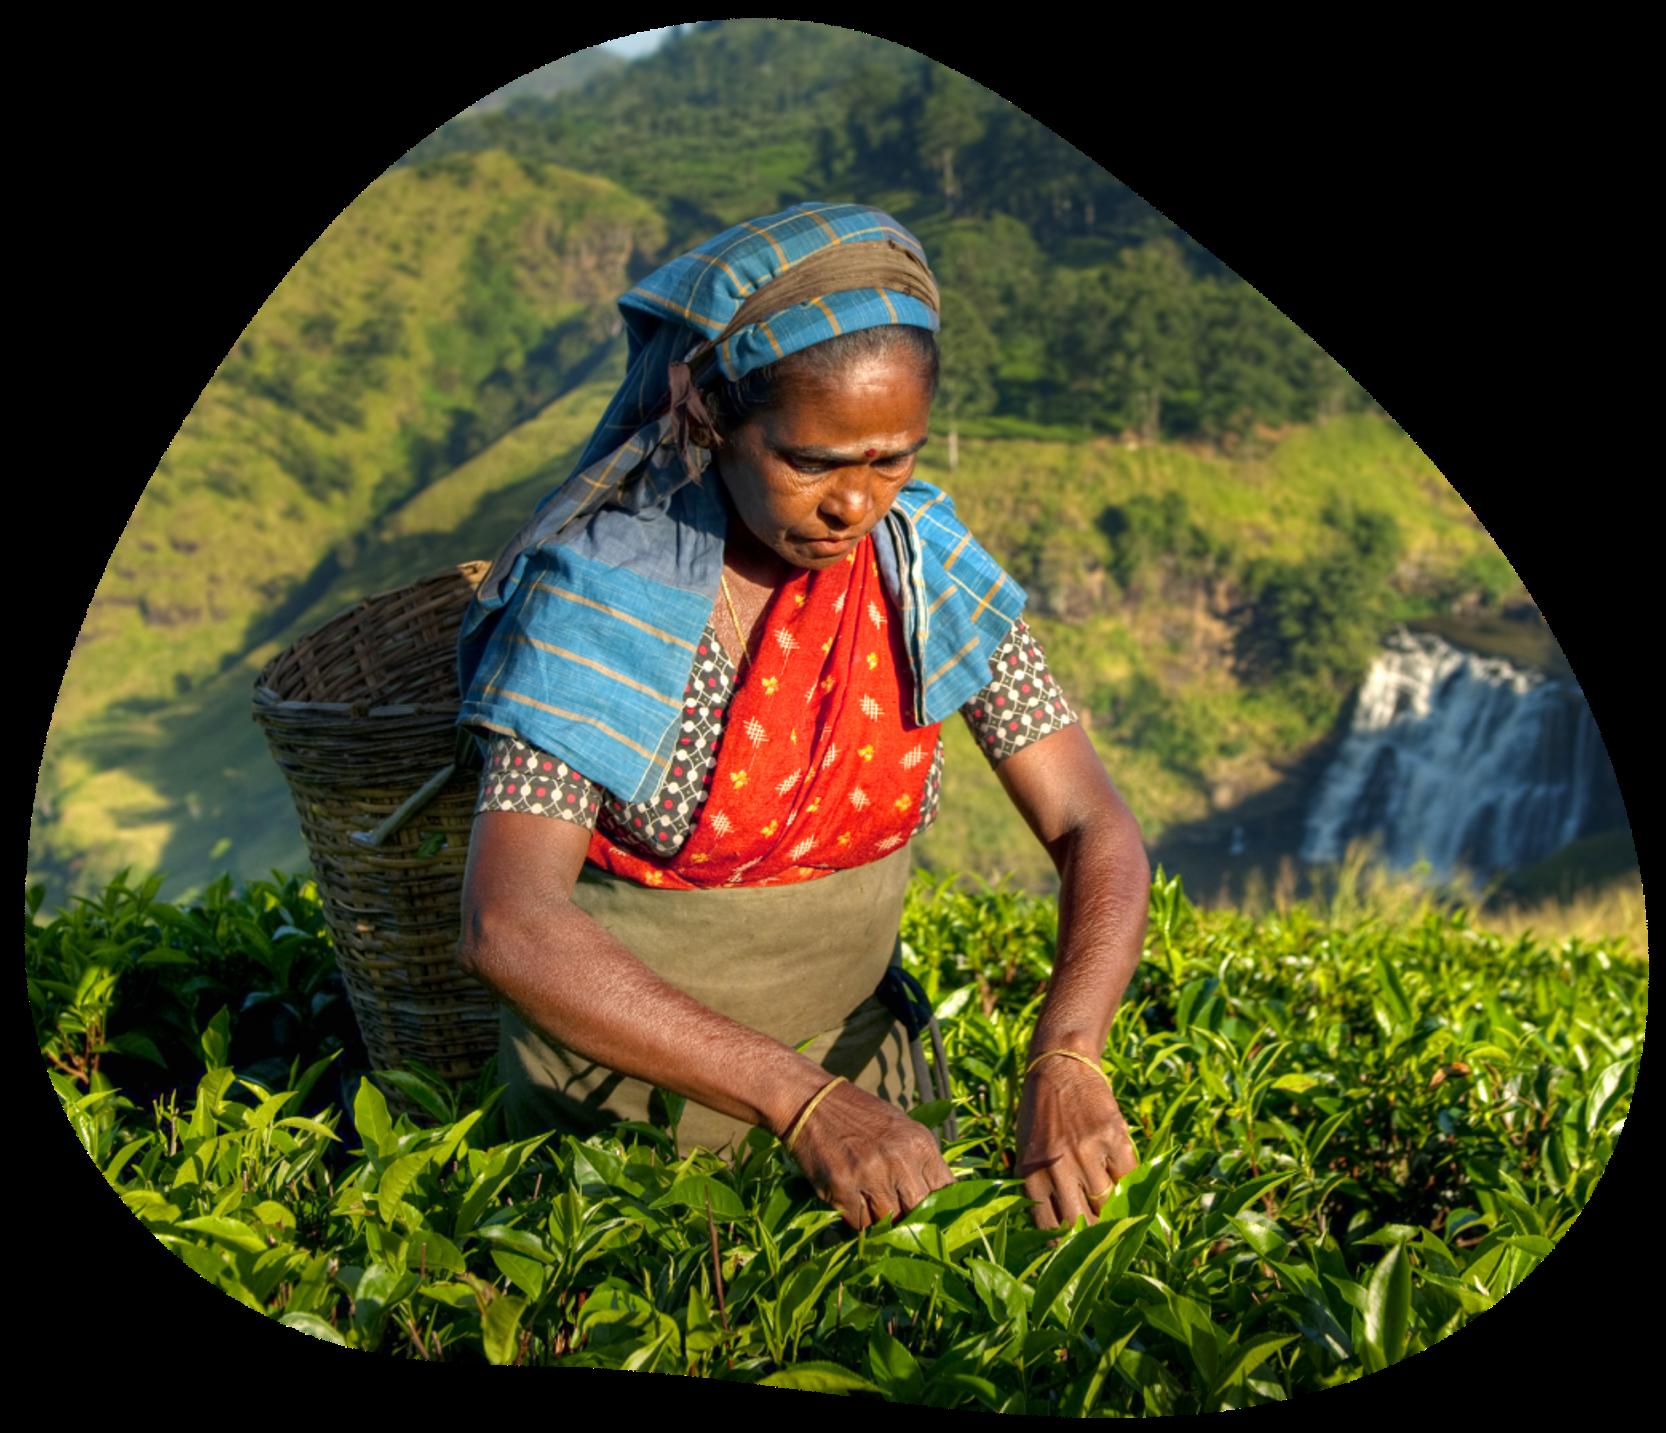 Woman farmer picking leaves